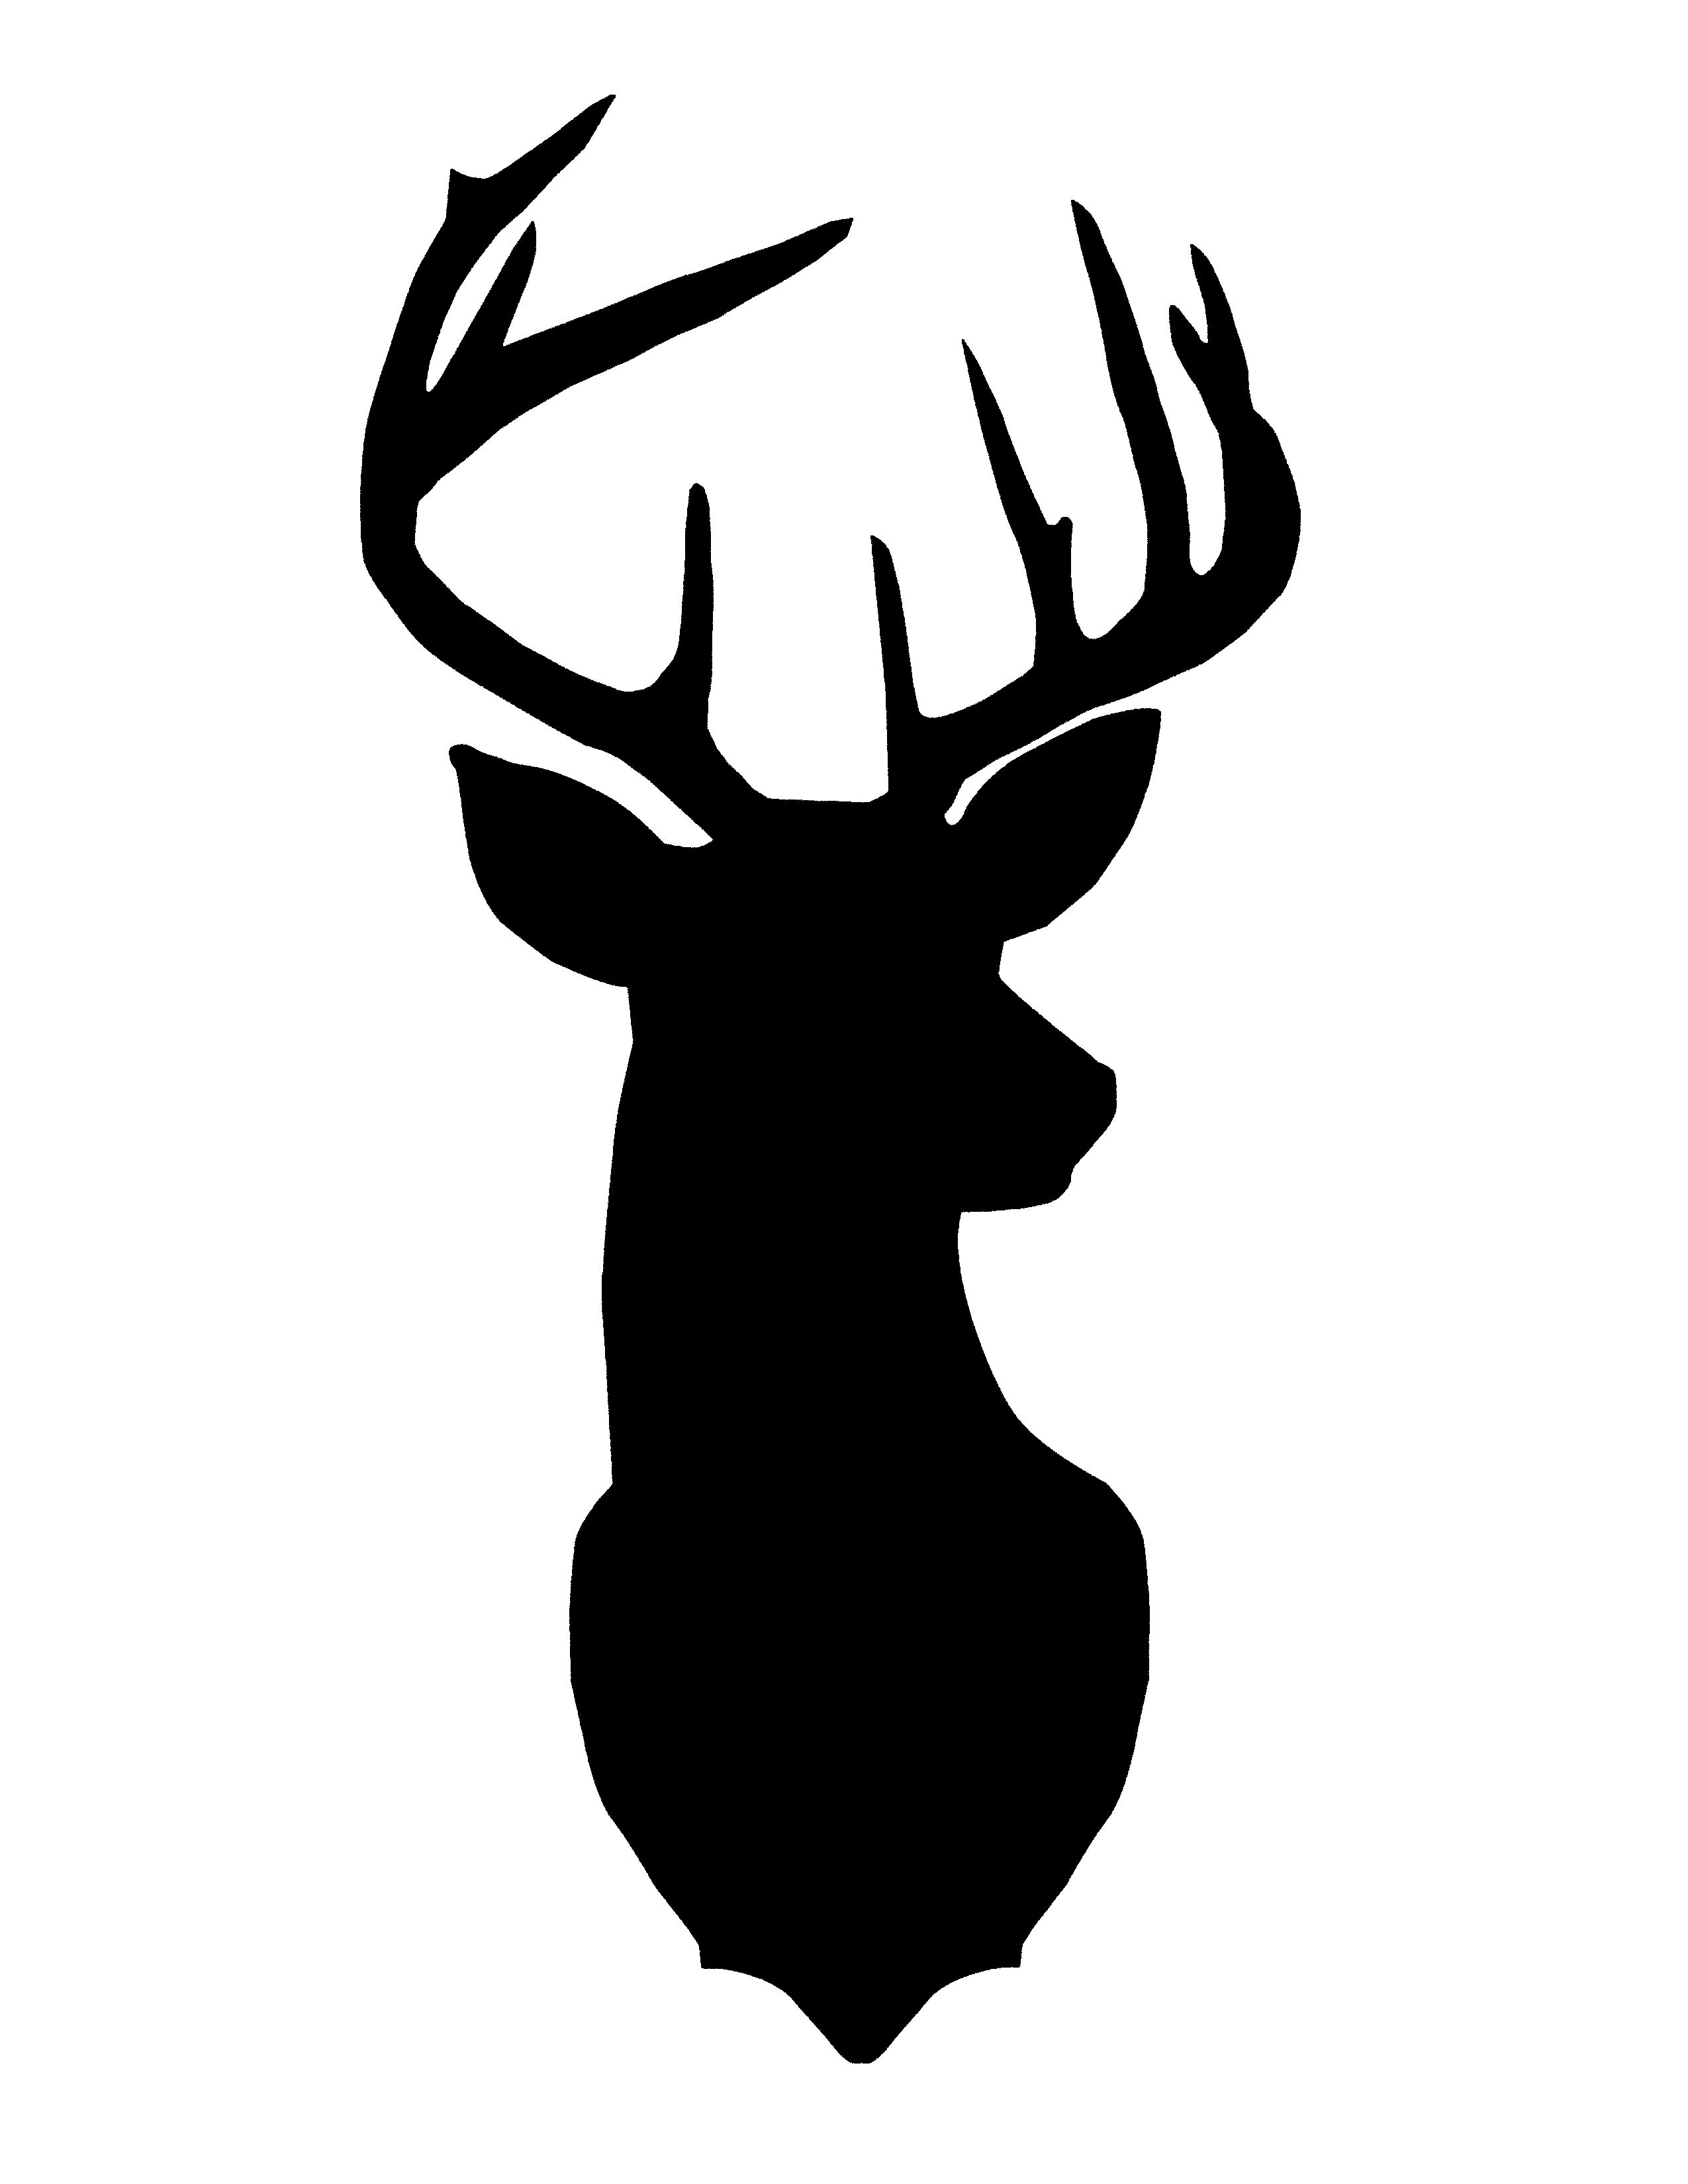 2550x3300 Deer Silhouette Art Christmas Craft And Gift Ideas Deer Head